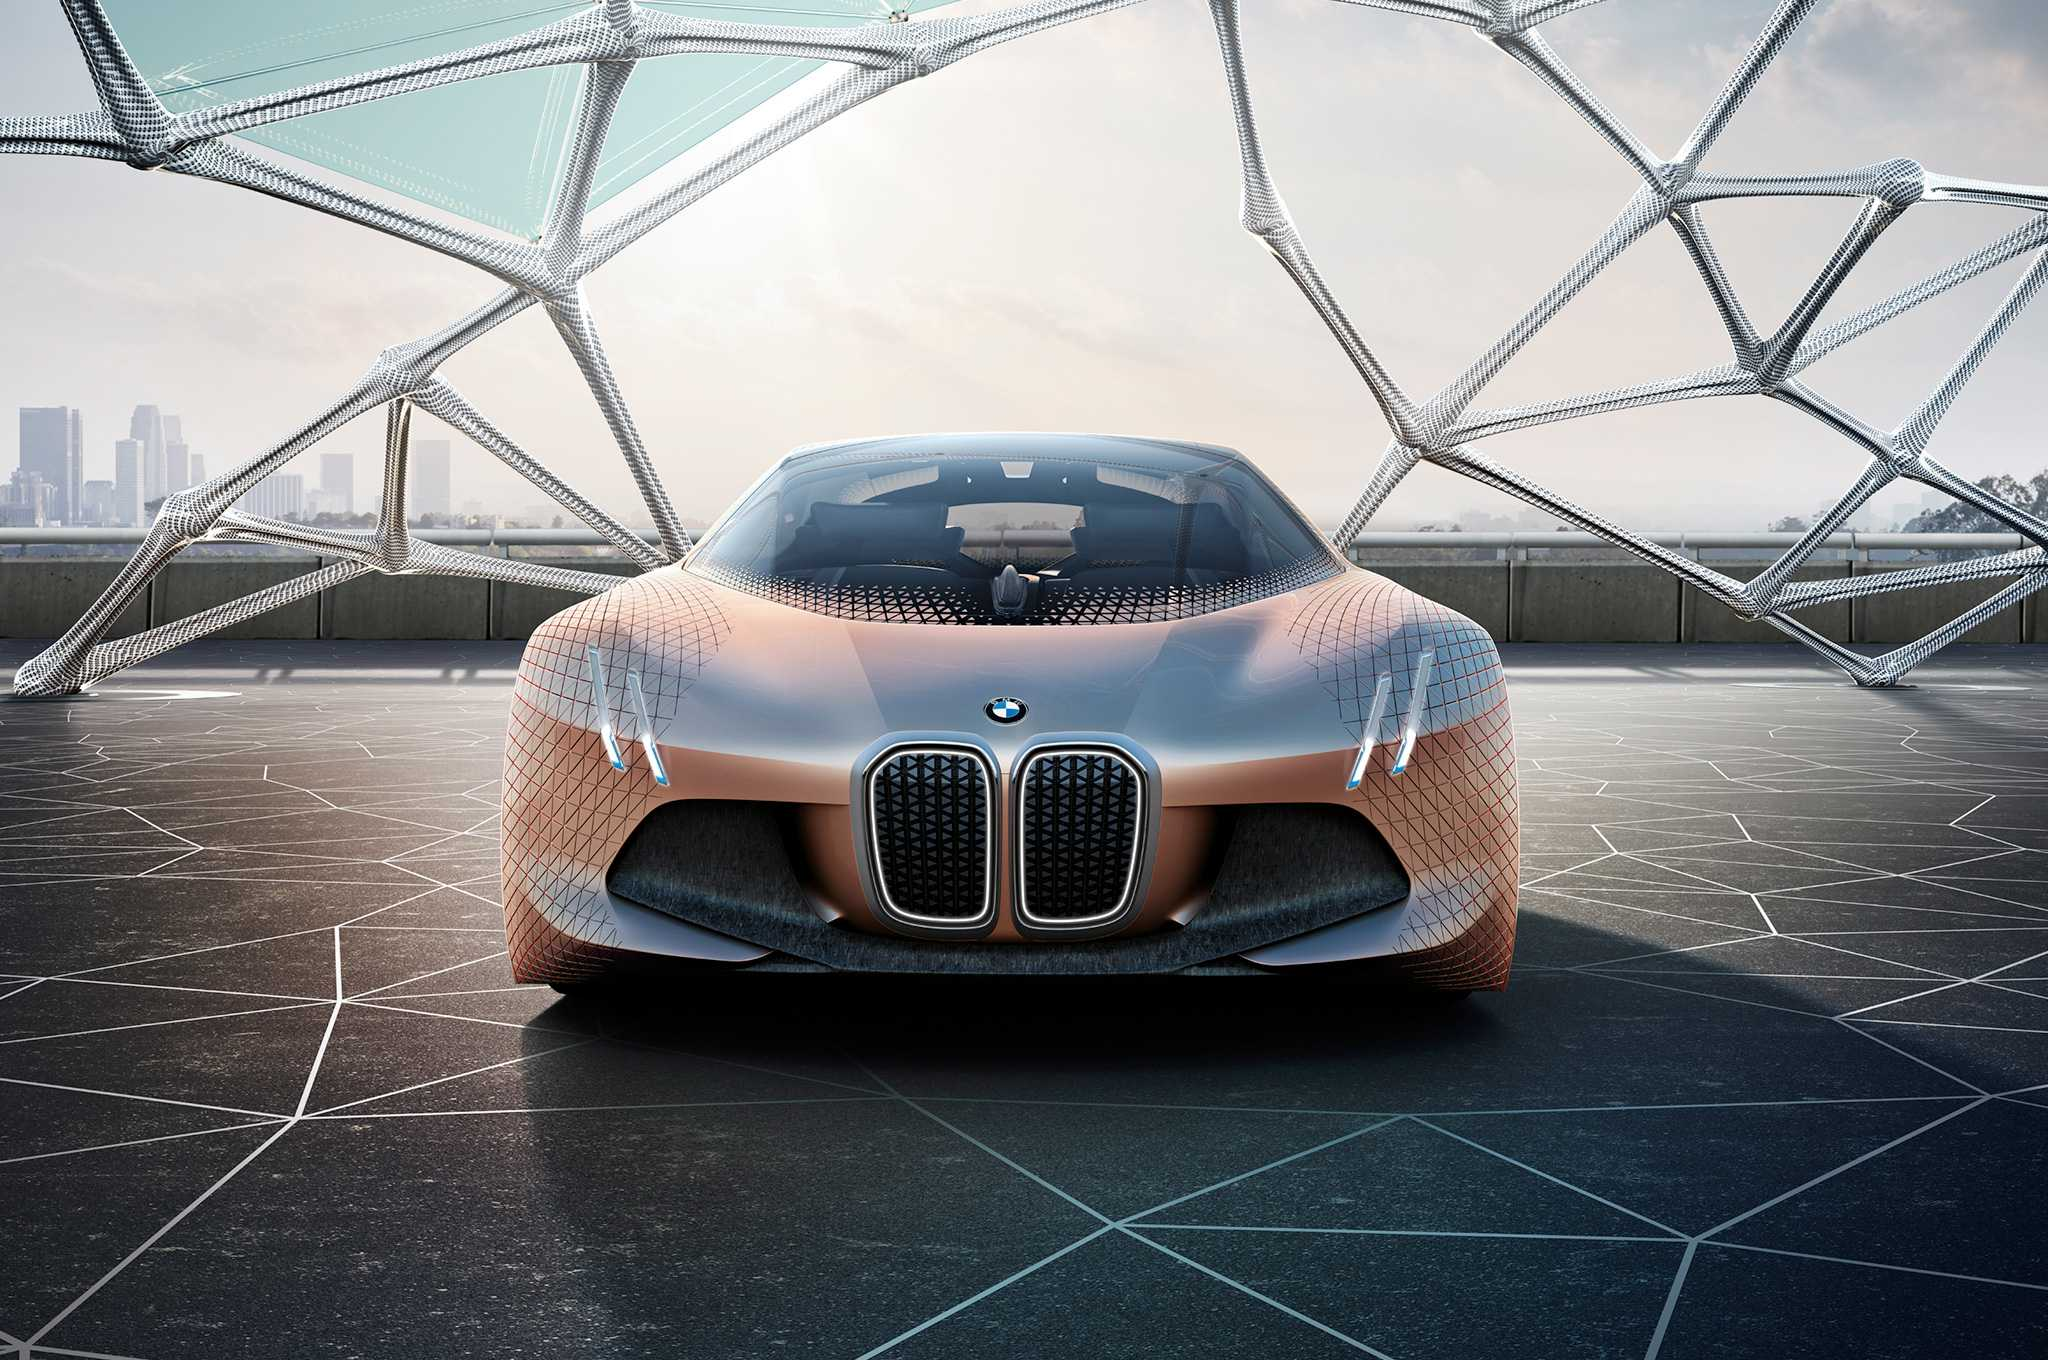 BMW to Launch INEXT Autonomous Car in 2021